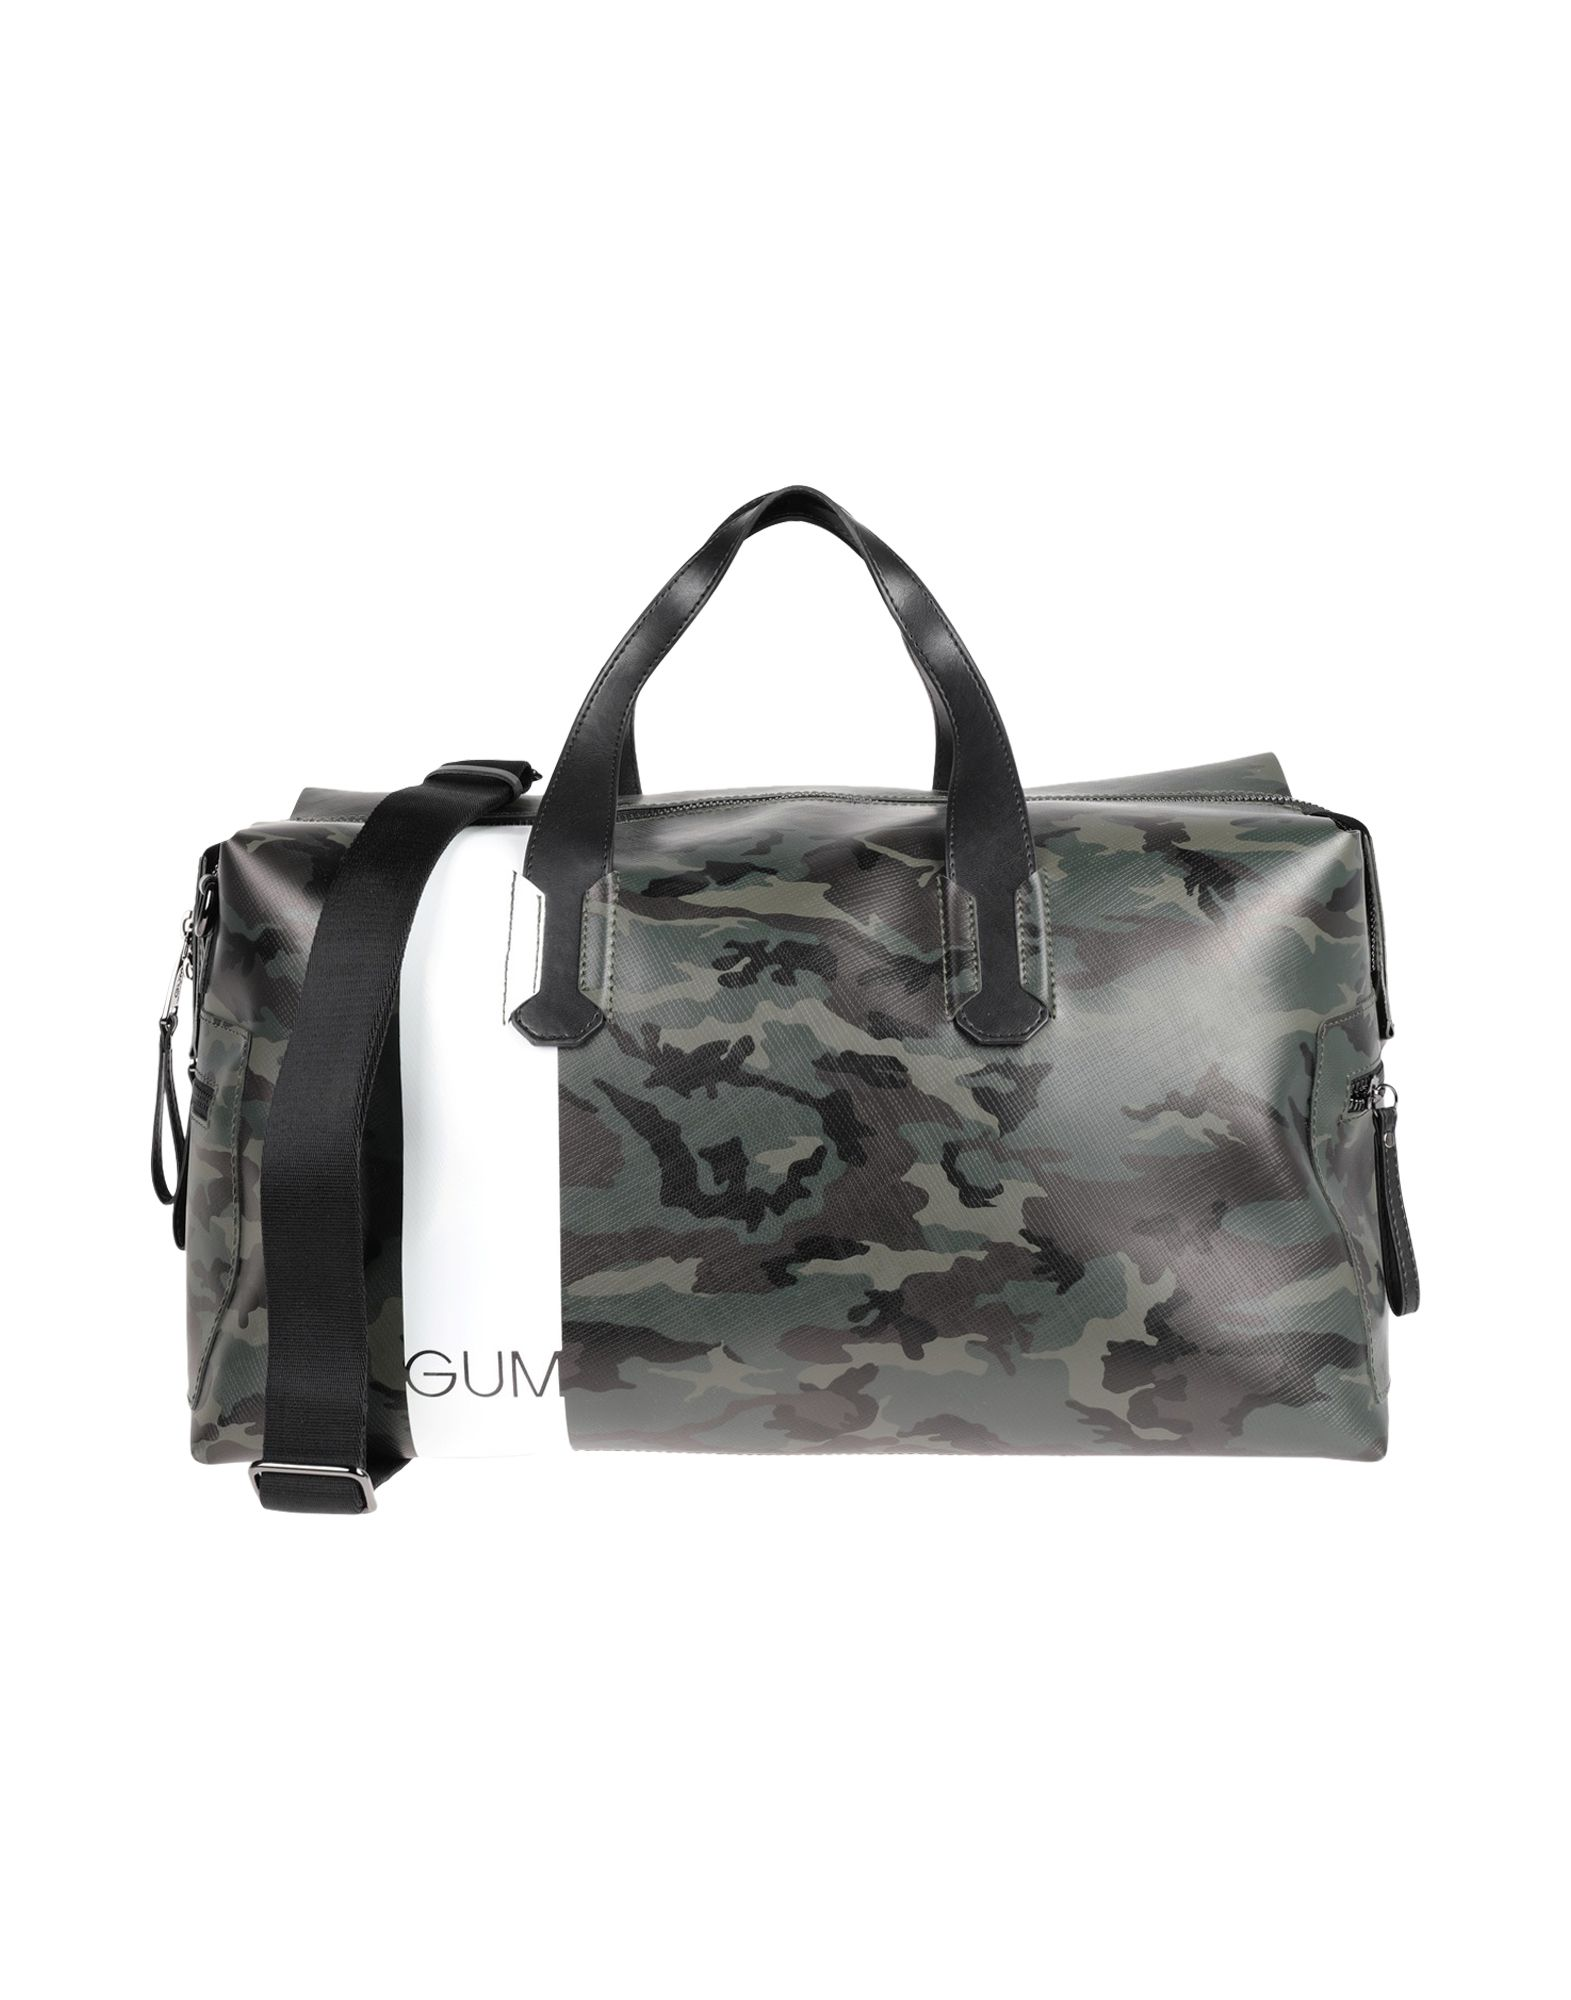 GUM BY GIANNI CHIARINI Дорожная сумка рюкзак gianni chiarini zn 9230 18pe ind marble